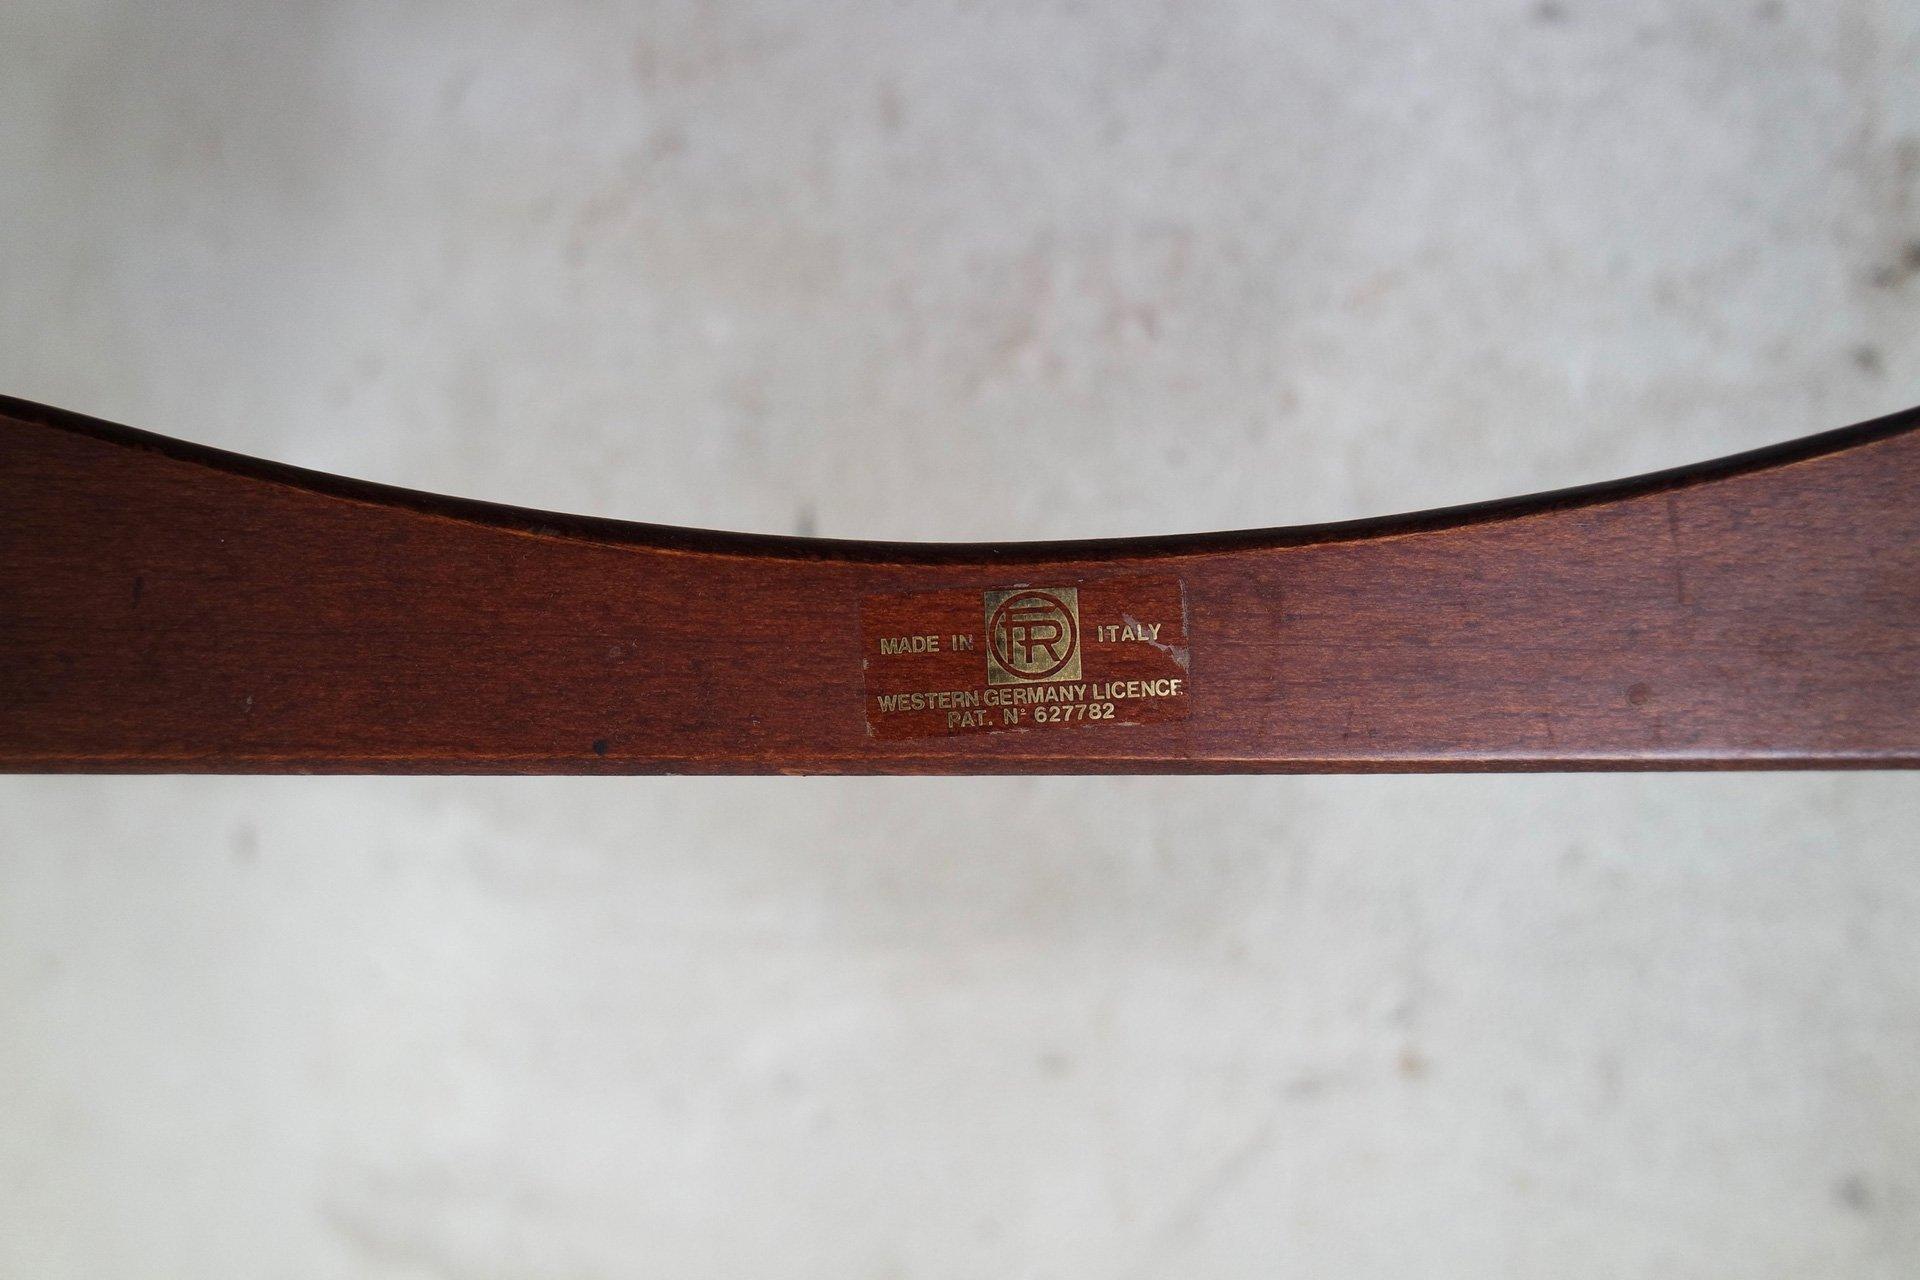 Fratelli Reguitti F.R. Western Germany Licence Mod. 820 Rekord 1960